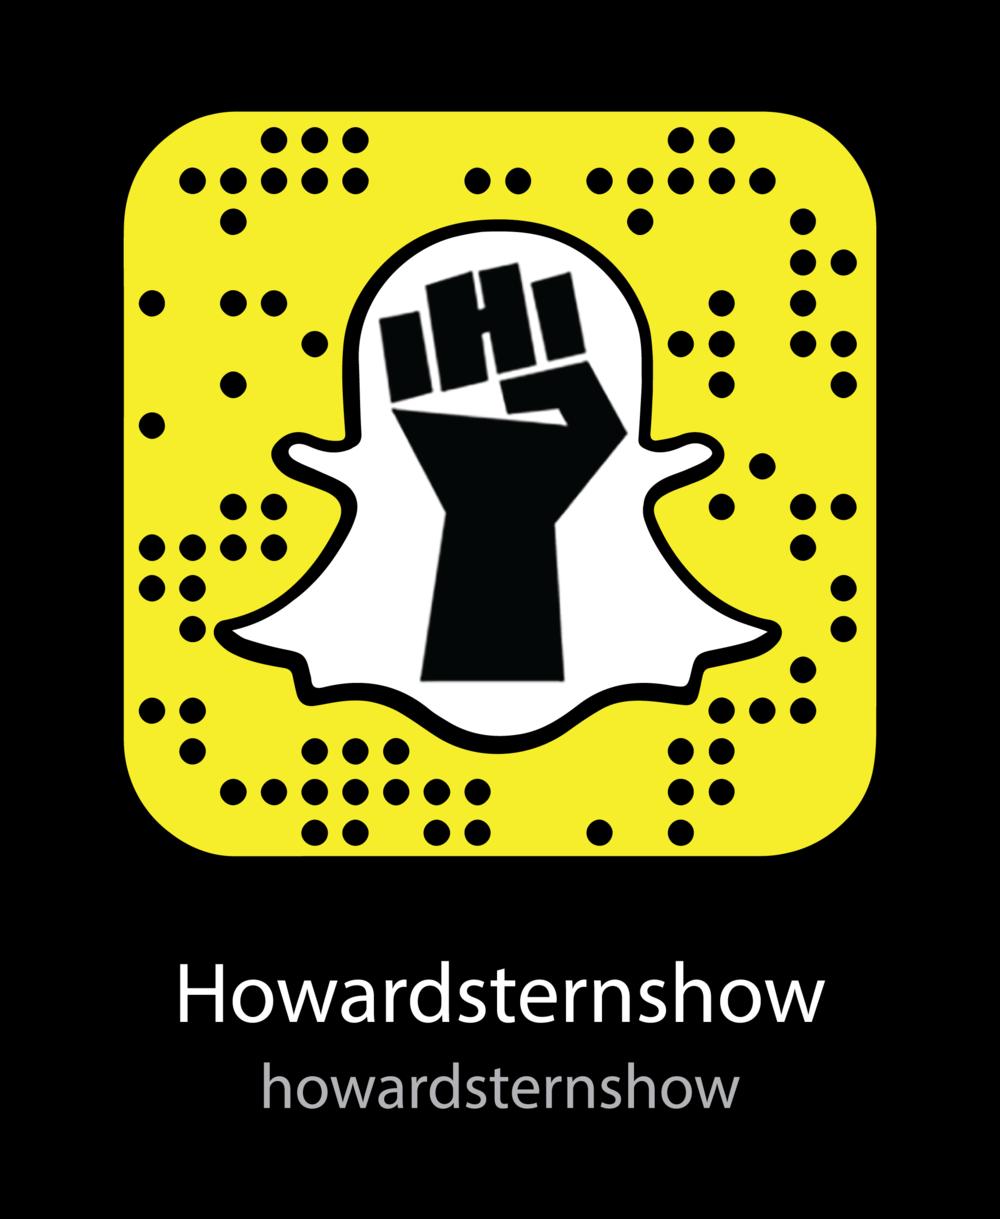 howardsternshow-Brands-snapchat-snapcode.png